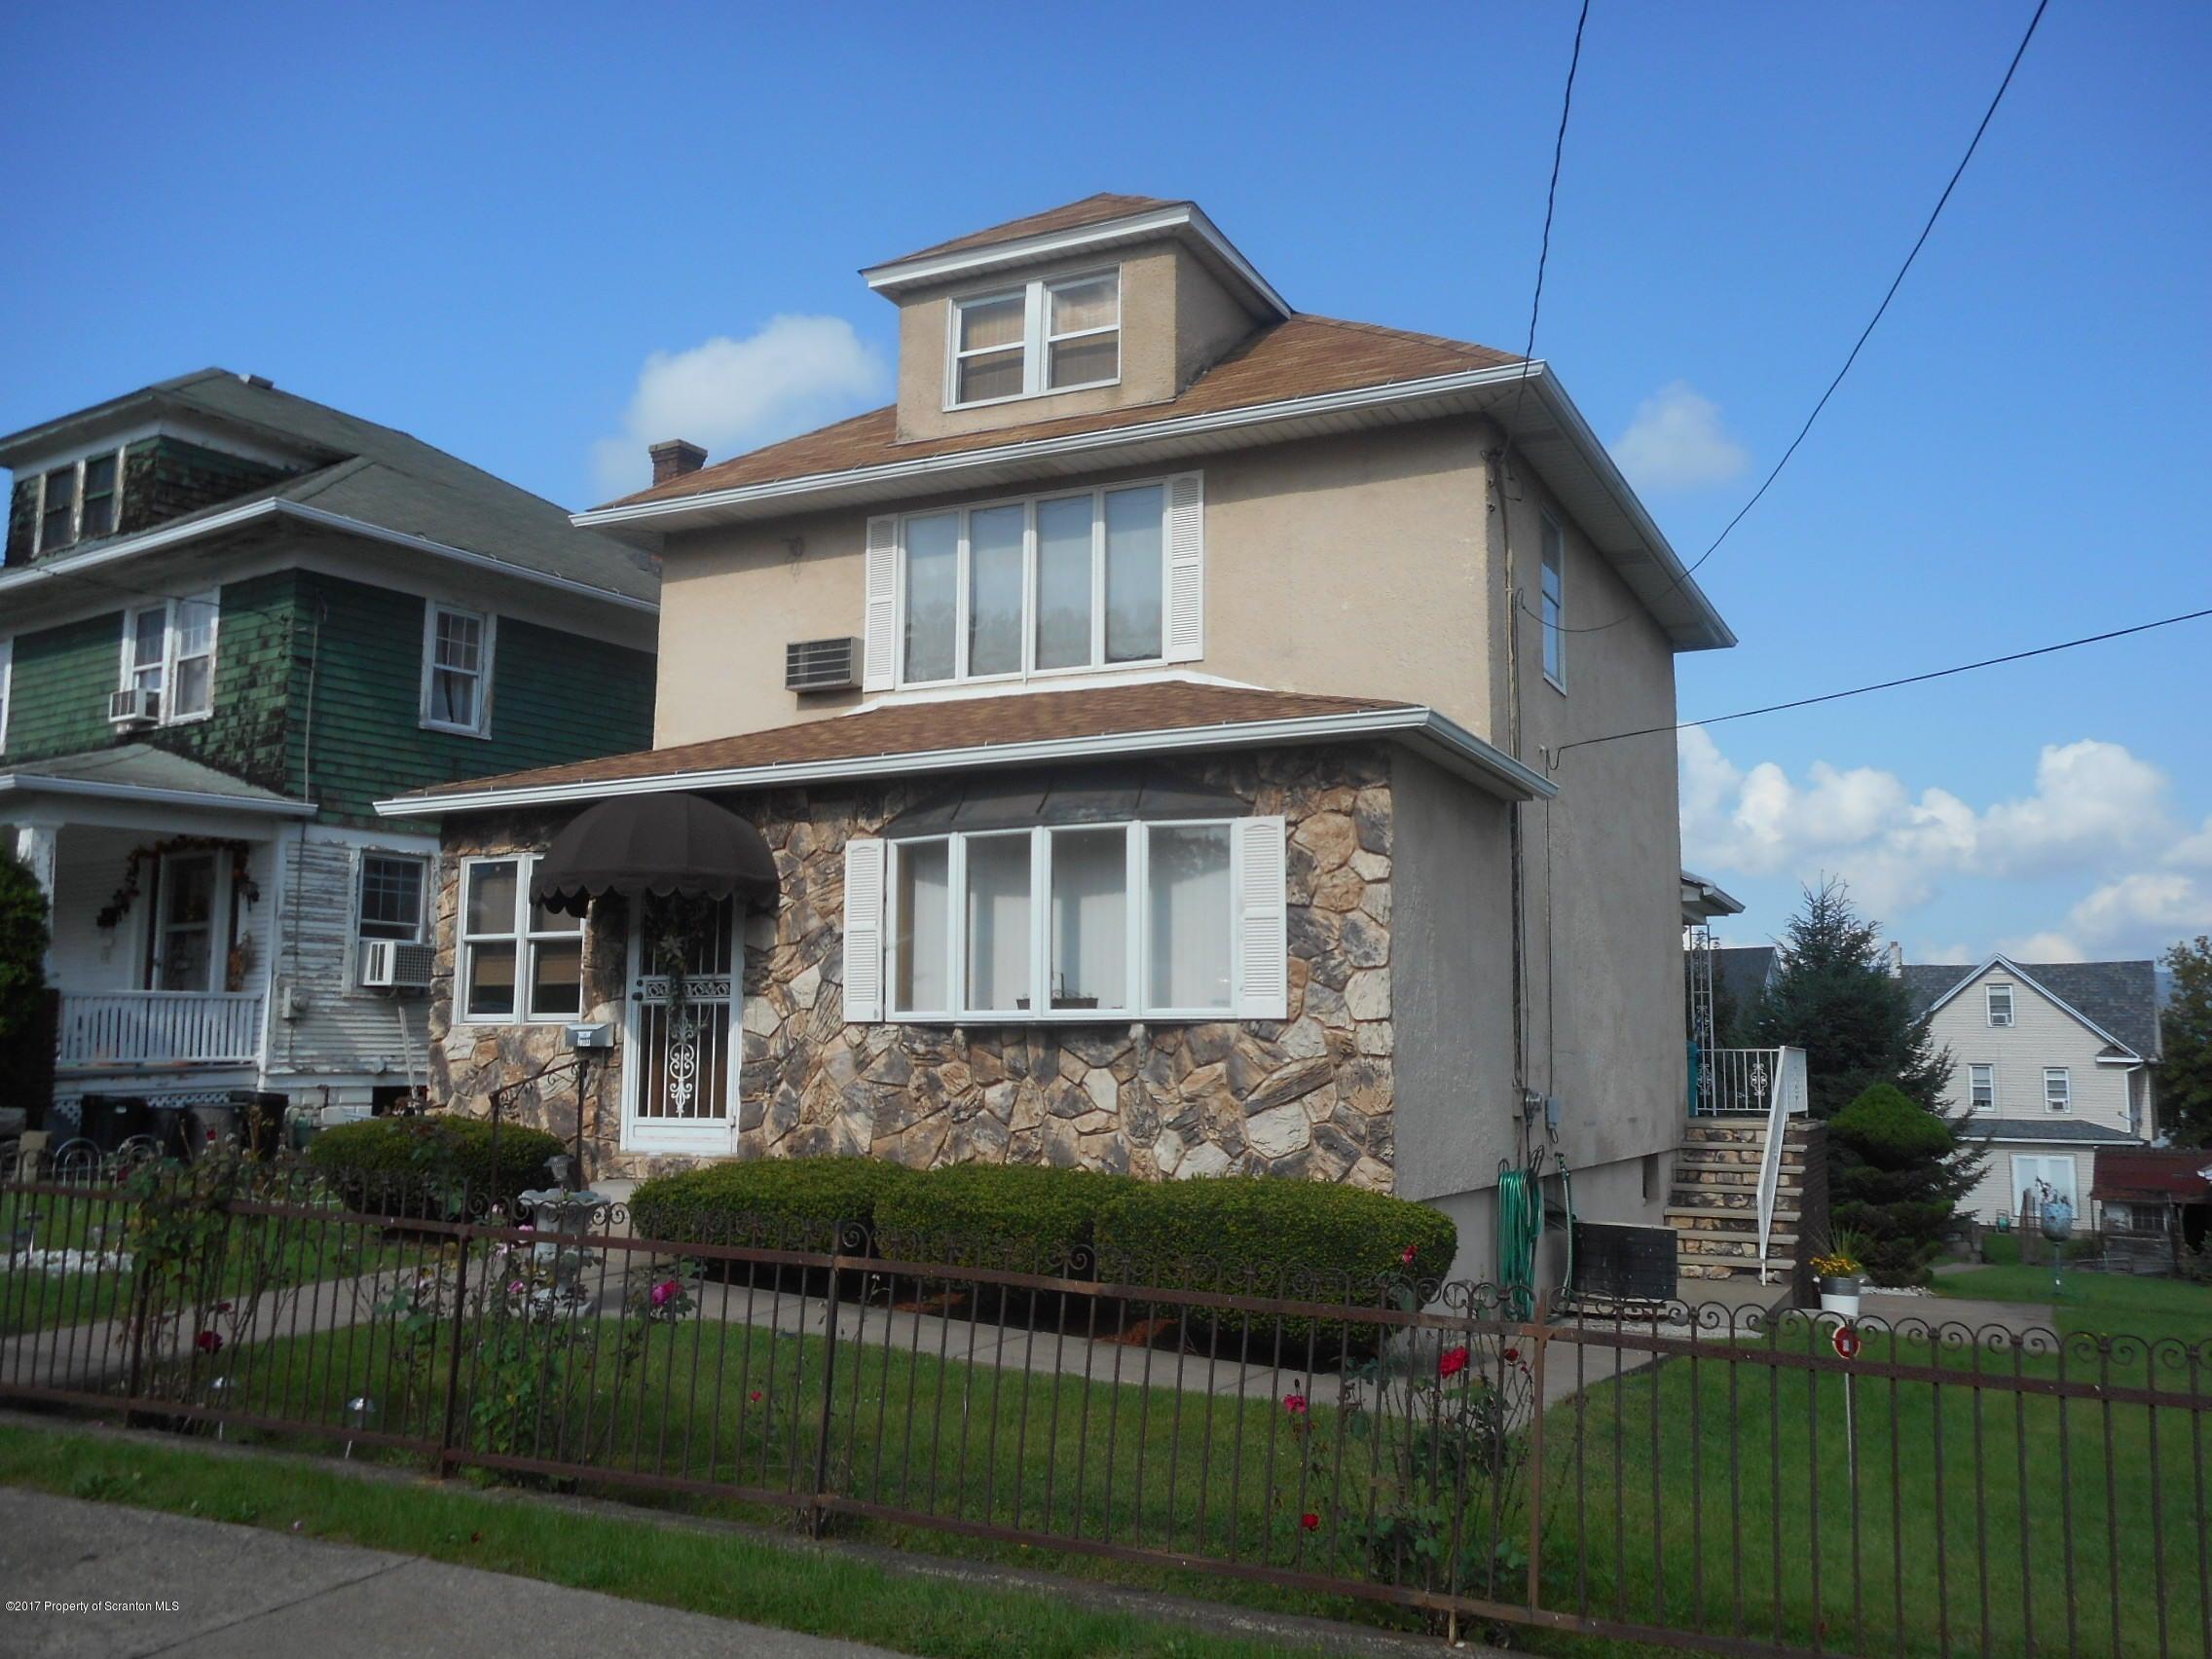 2304 Prospect Ave, Scranton, PA 18505